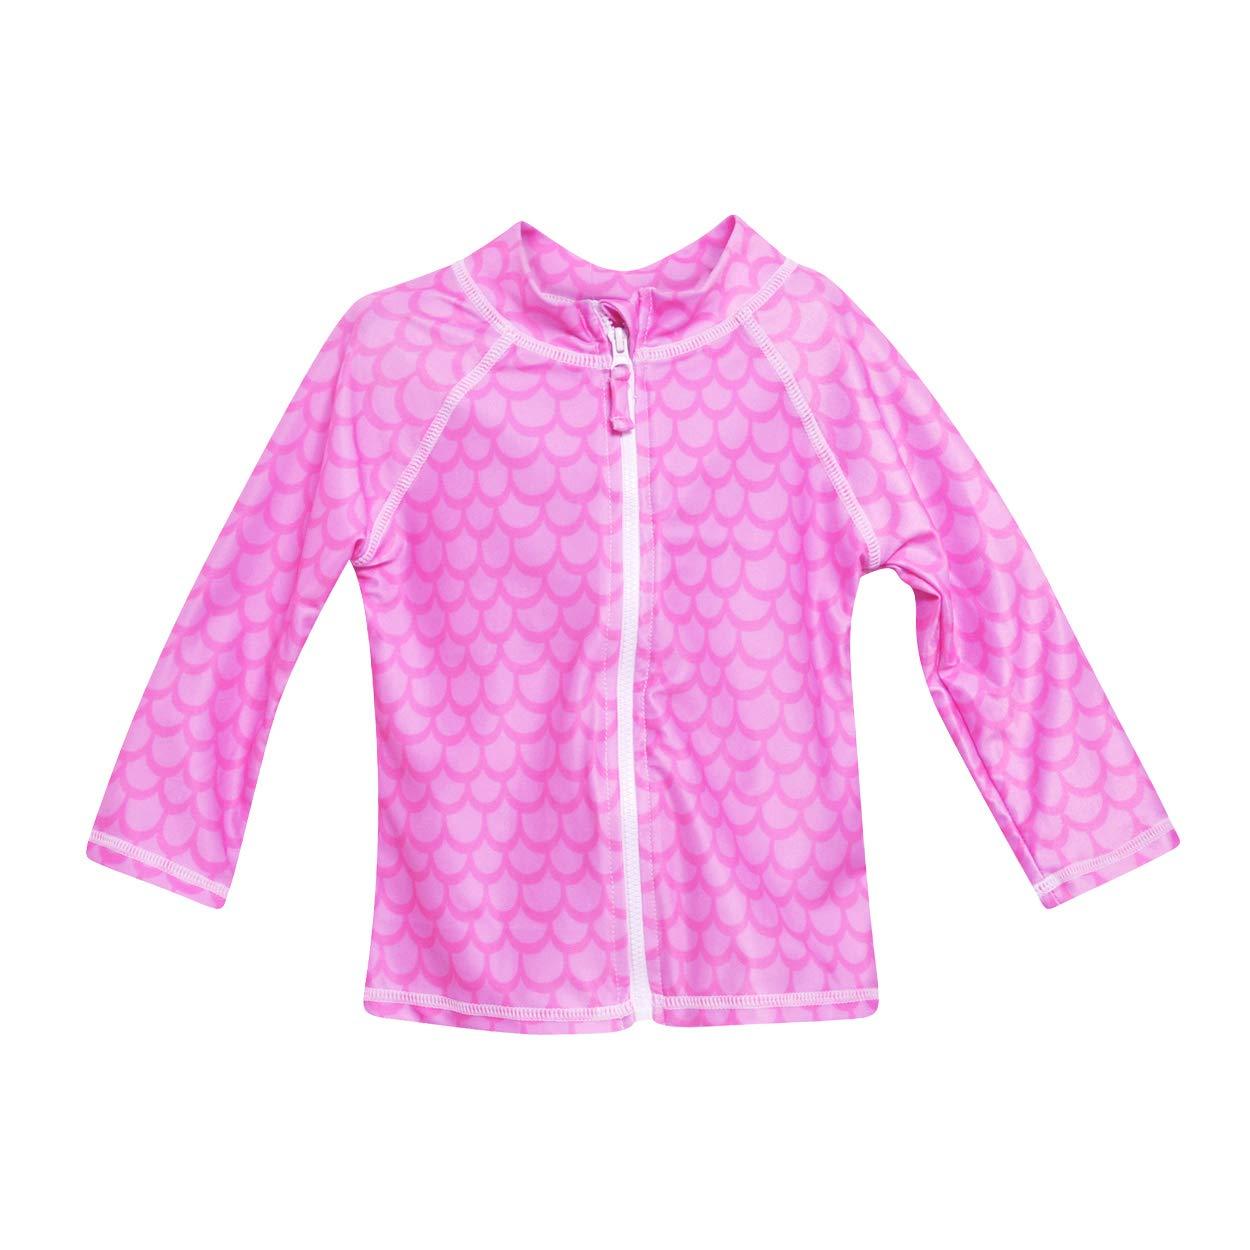 Flap Happy Girls Toddler UPF 50 Zip Front Swim Jacket